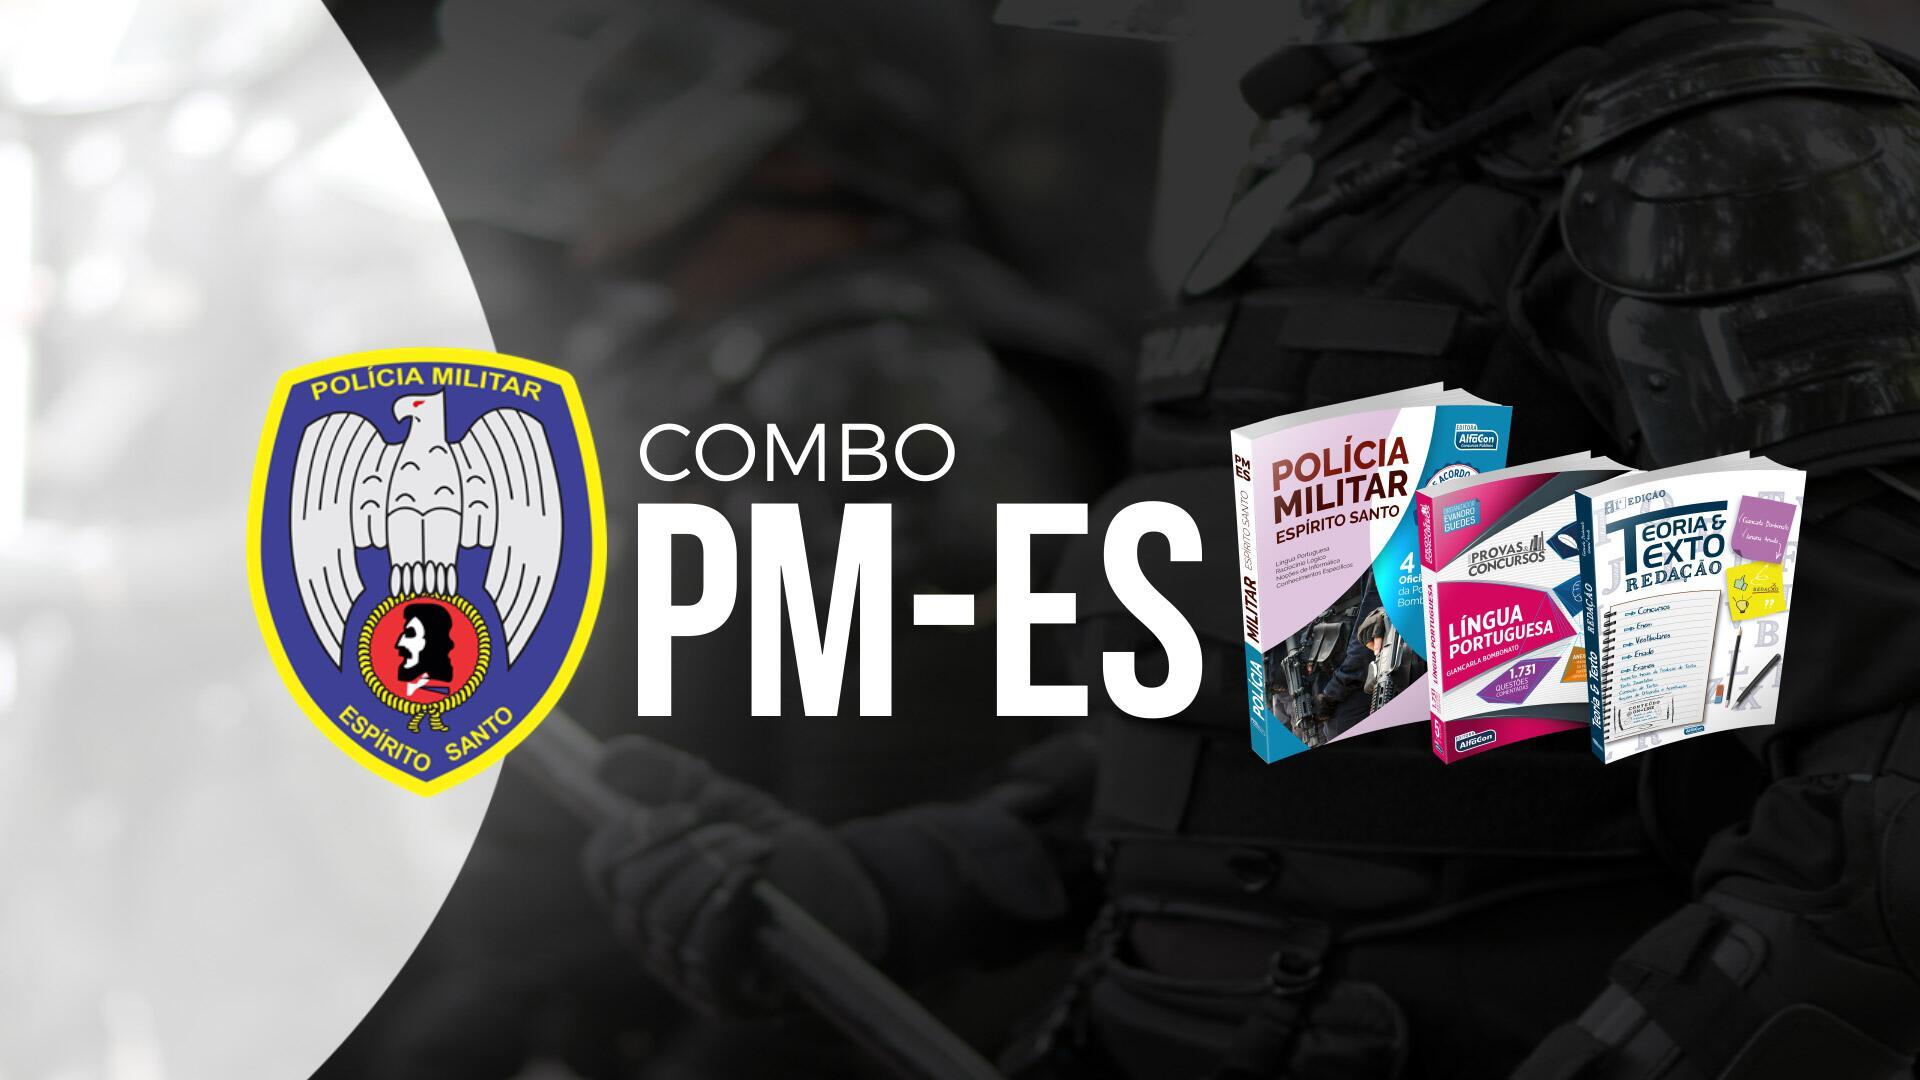 Combo PM ES - Soldado da Policia Militar do Espirito Santo